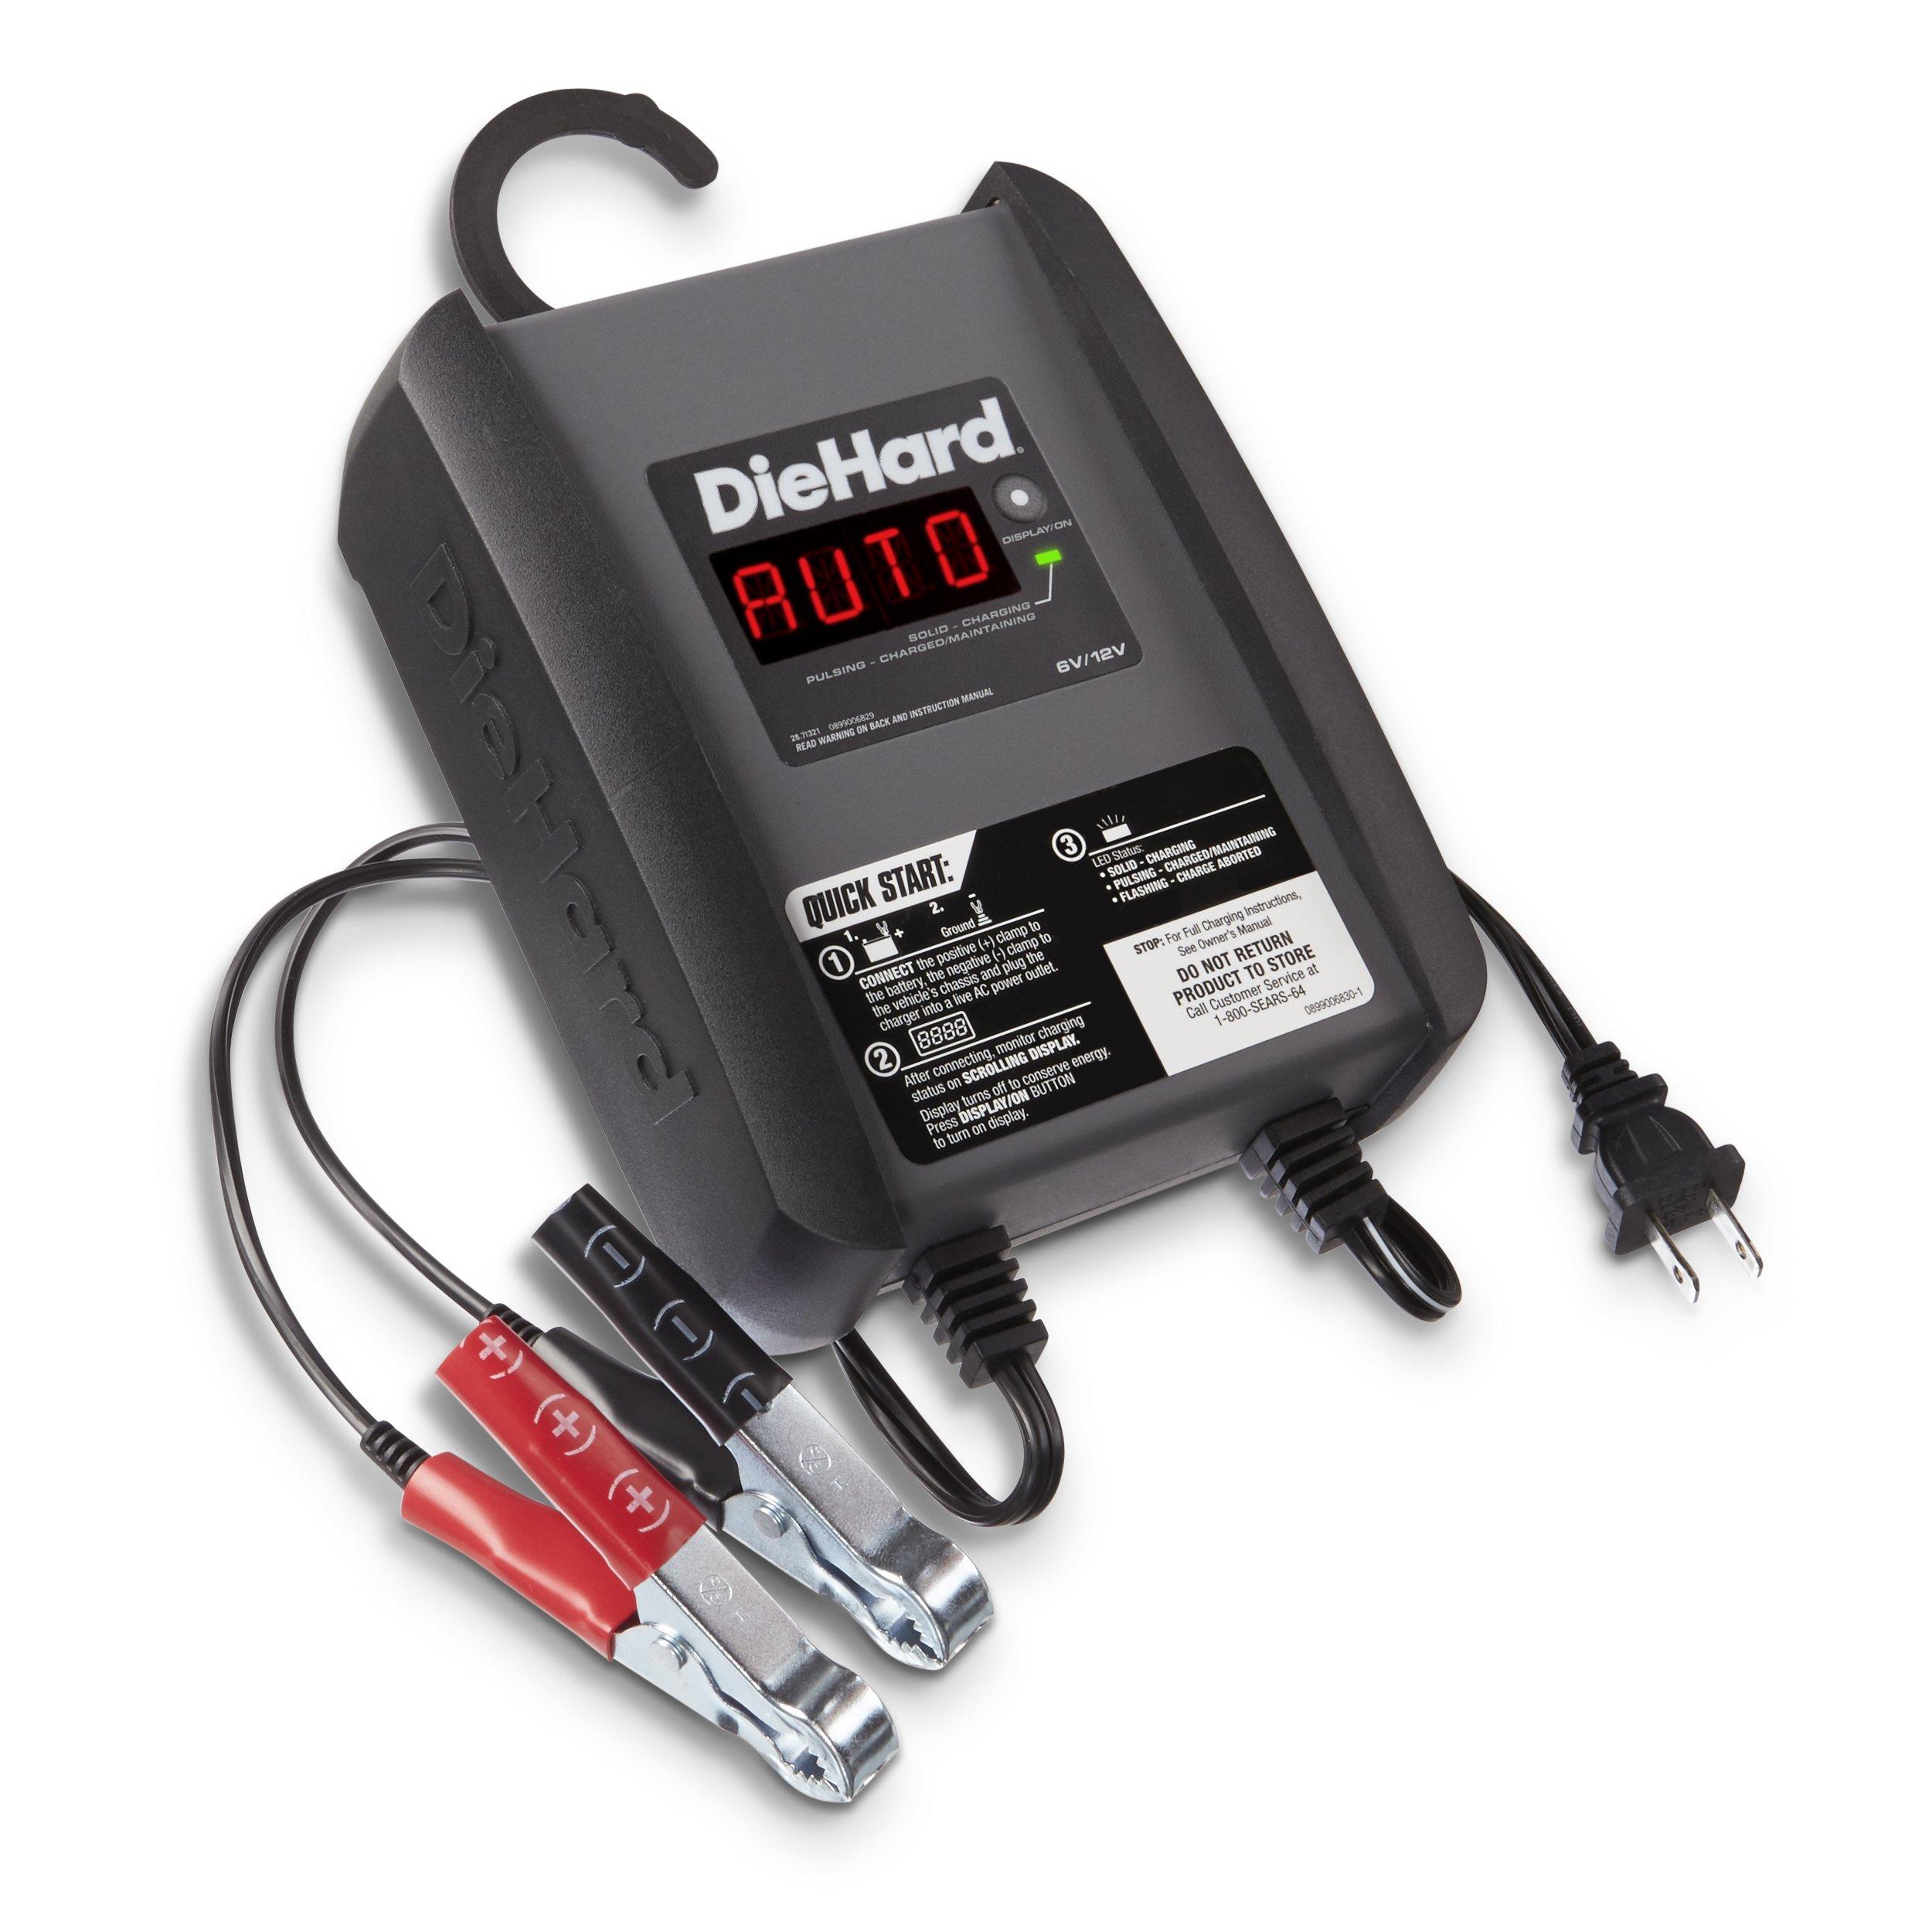 DieHard 71321 Platinum Smart Battery Charger & Maintainer (6/12 Volt 6 Amp)